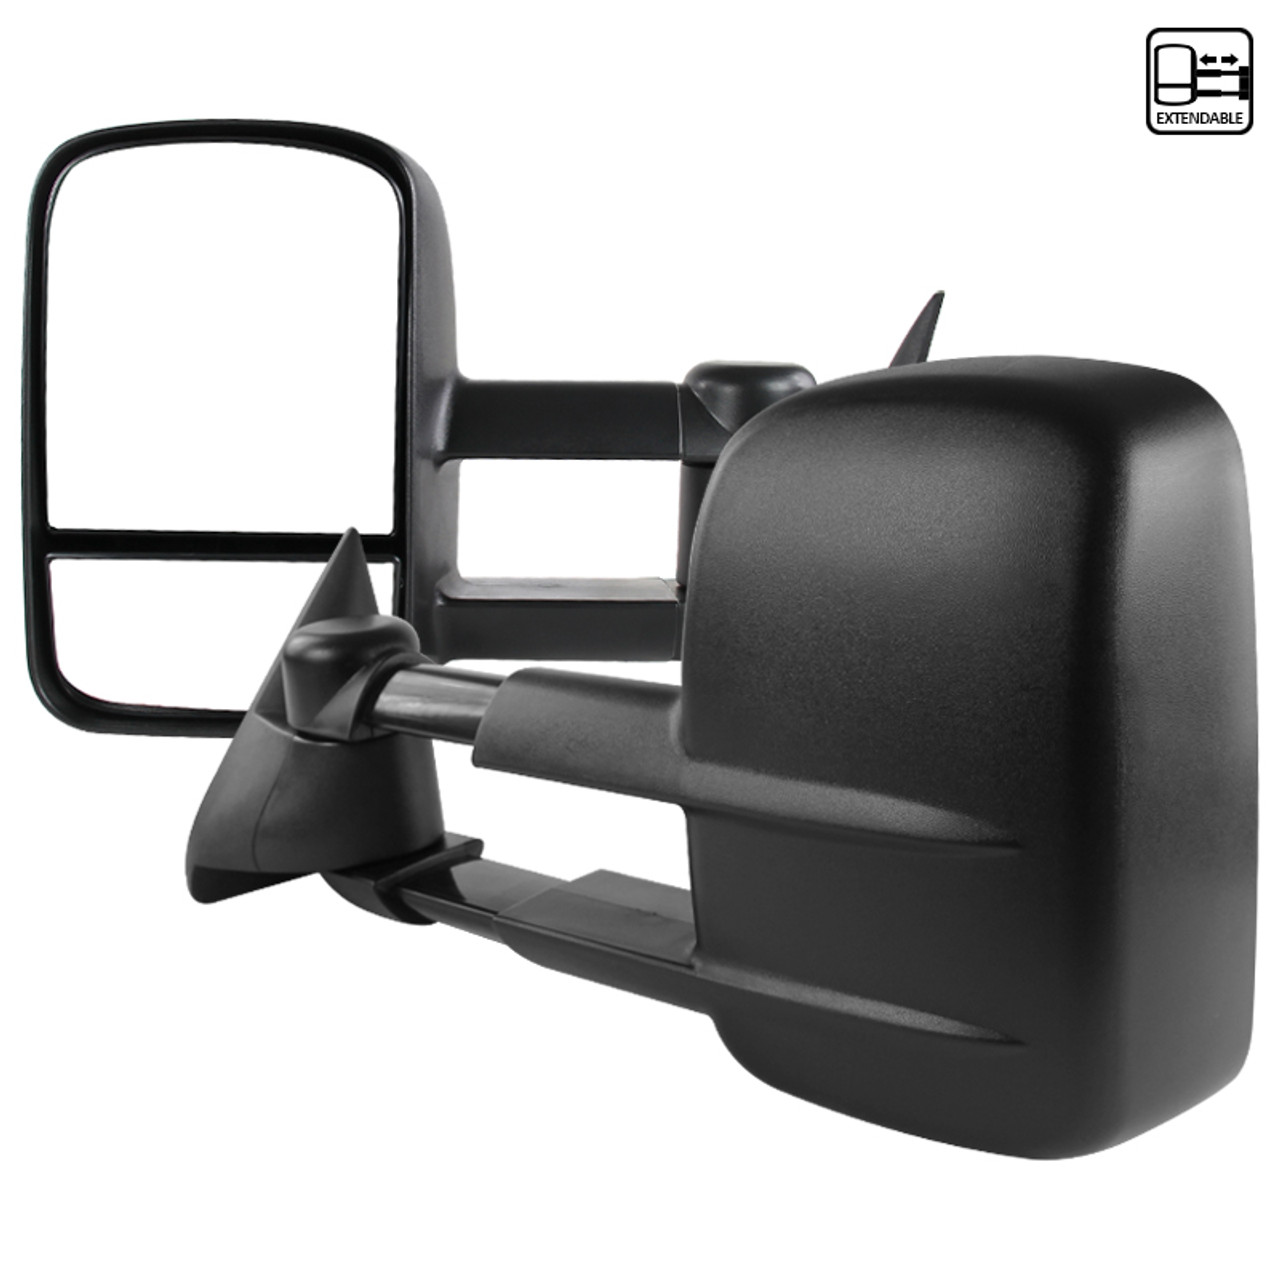 cciyu Left Right Car Mirrors Manual Adjusted Manual Telescoping ...